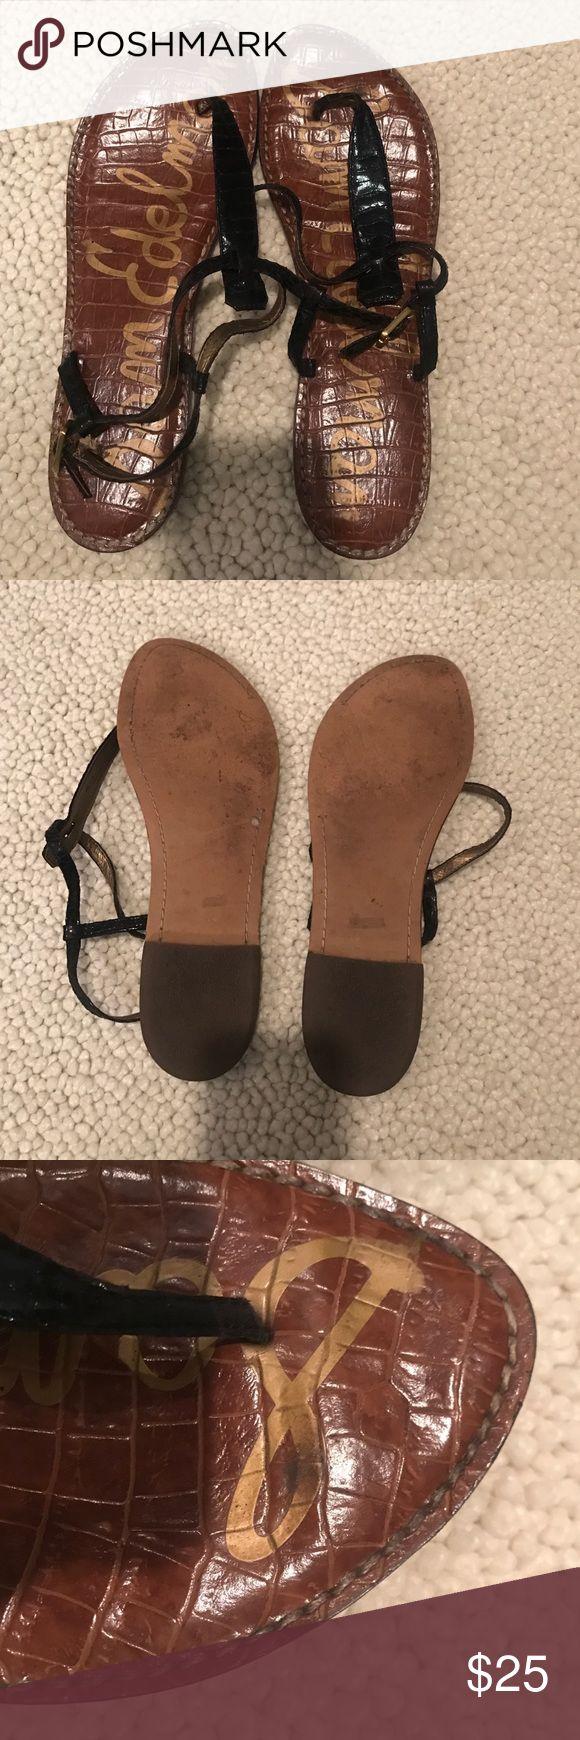 Size 10 Black Sam Edelman Gigi Sandal! Previously loved! Size 10 Black Sam Edelman Gigi sandal! Still in good condition for the amount that I wore them. Sam Edelman Shoes Sandals